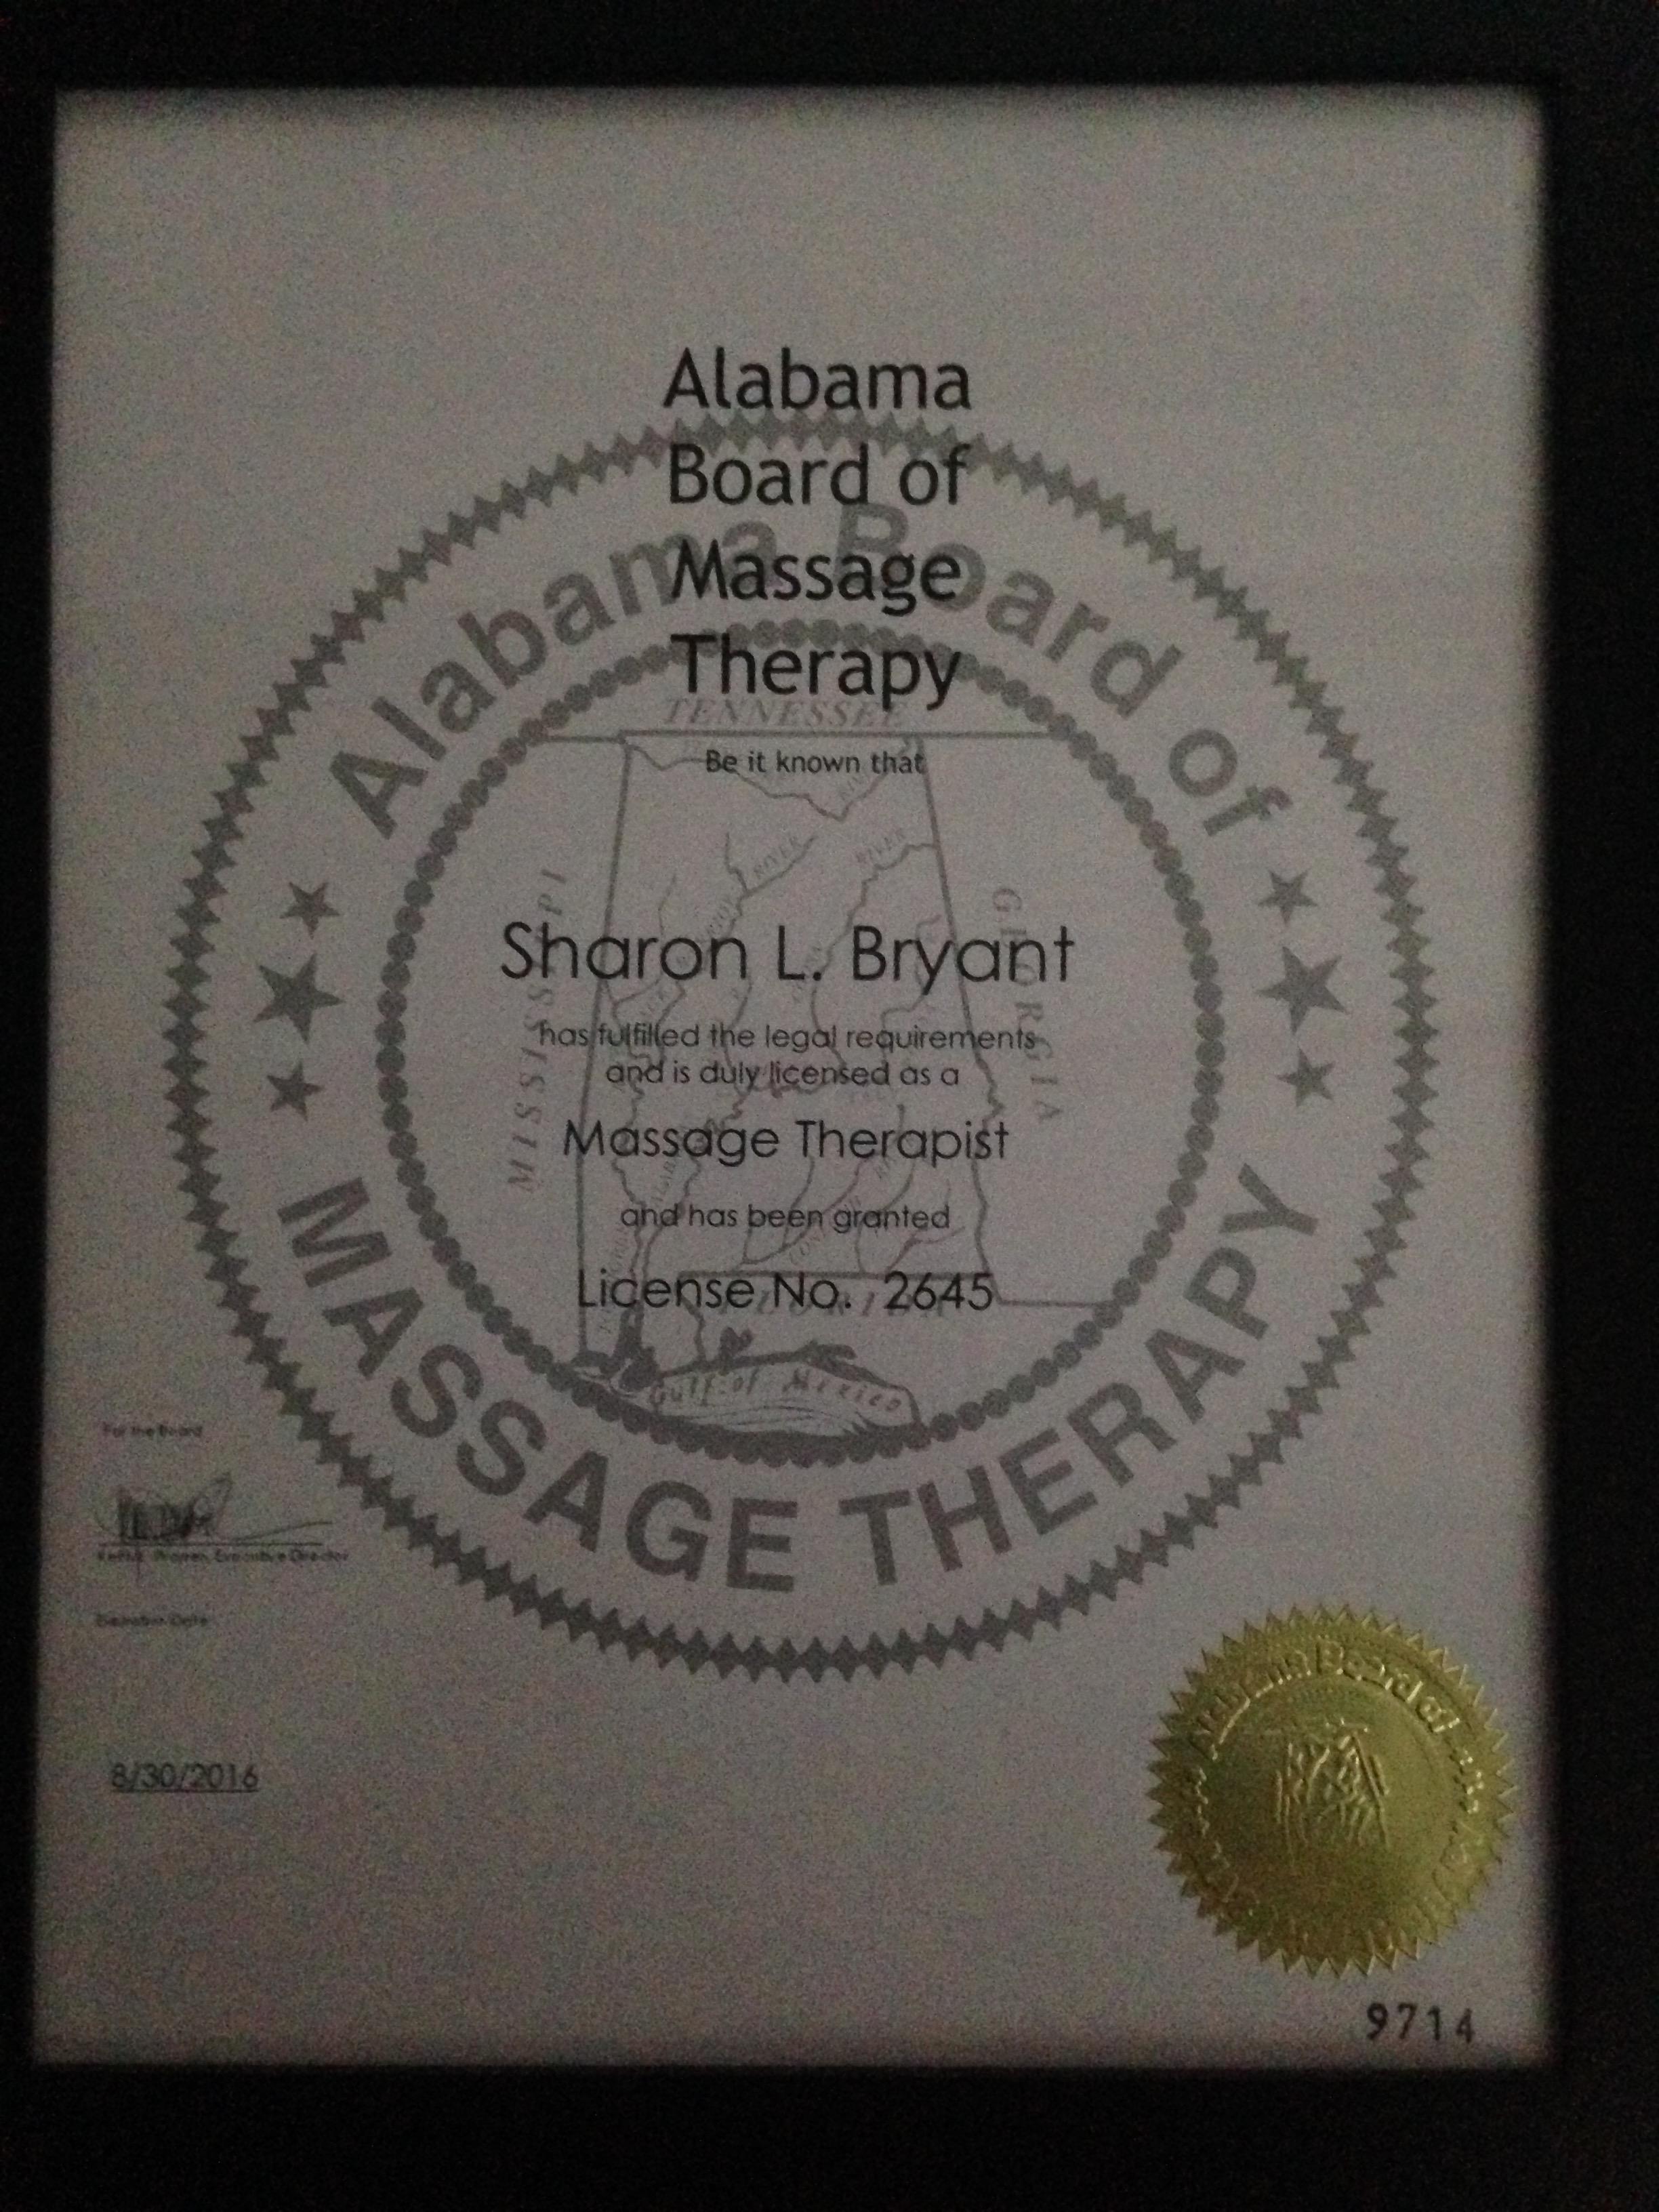 Alabama Harvest Moon Massage Therapy And Reflexology